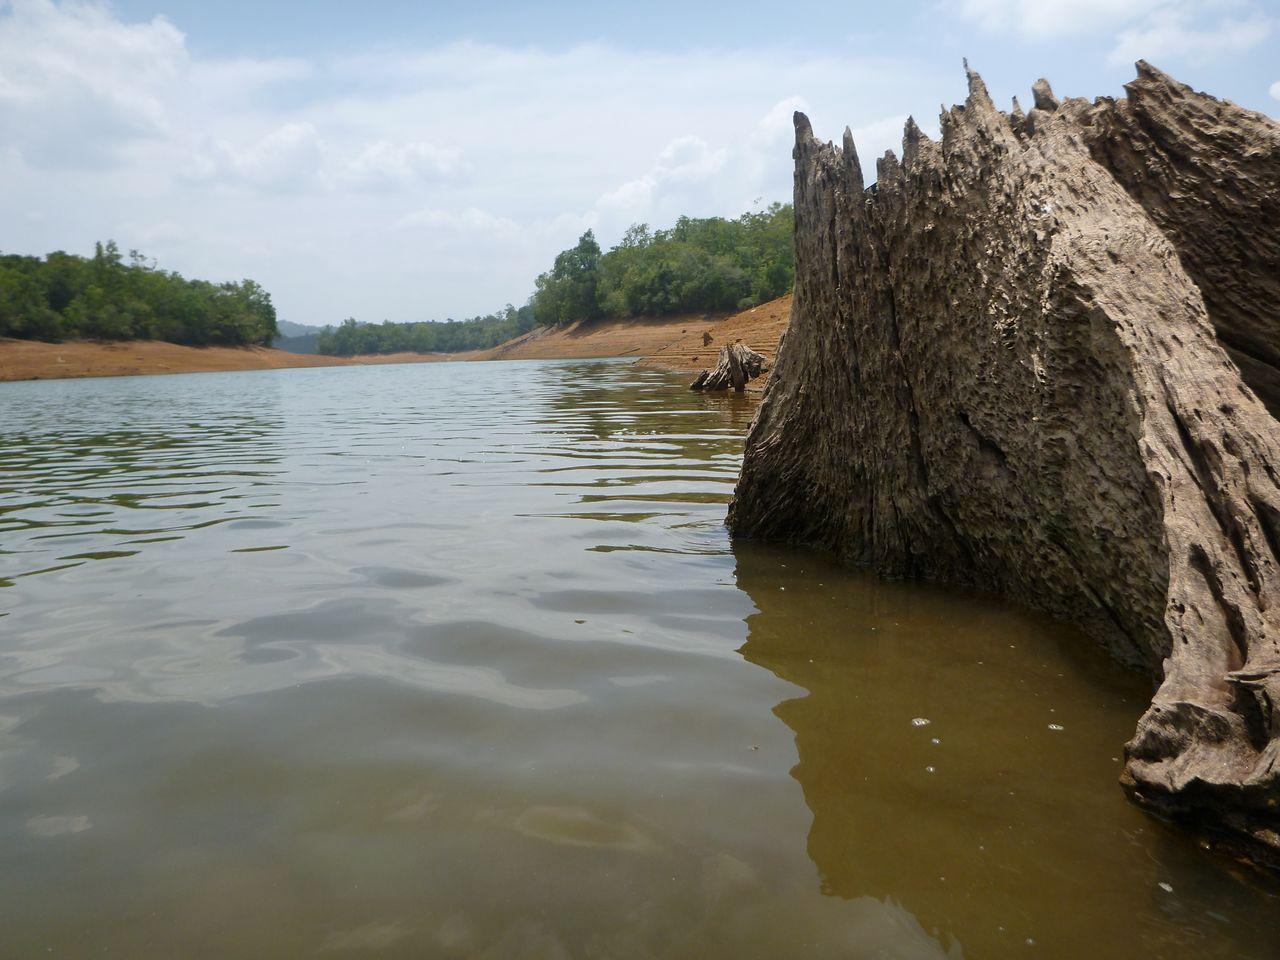 IndiaPass: Dzsungeltúra